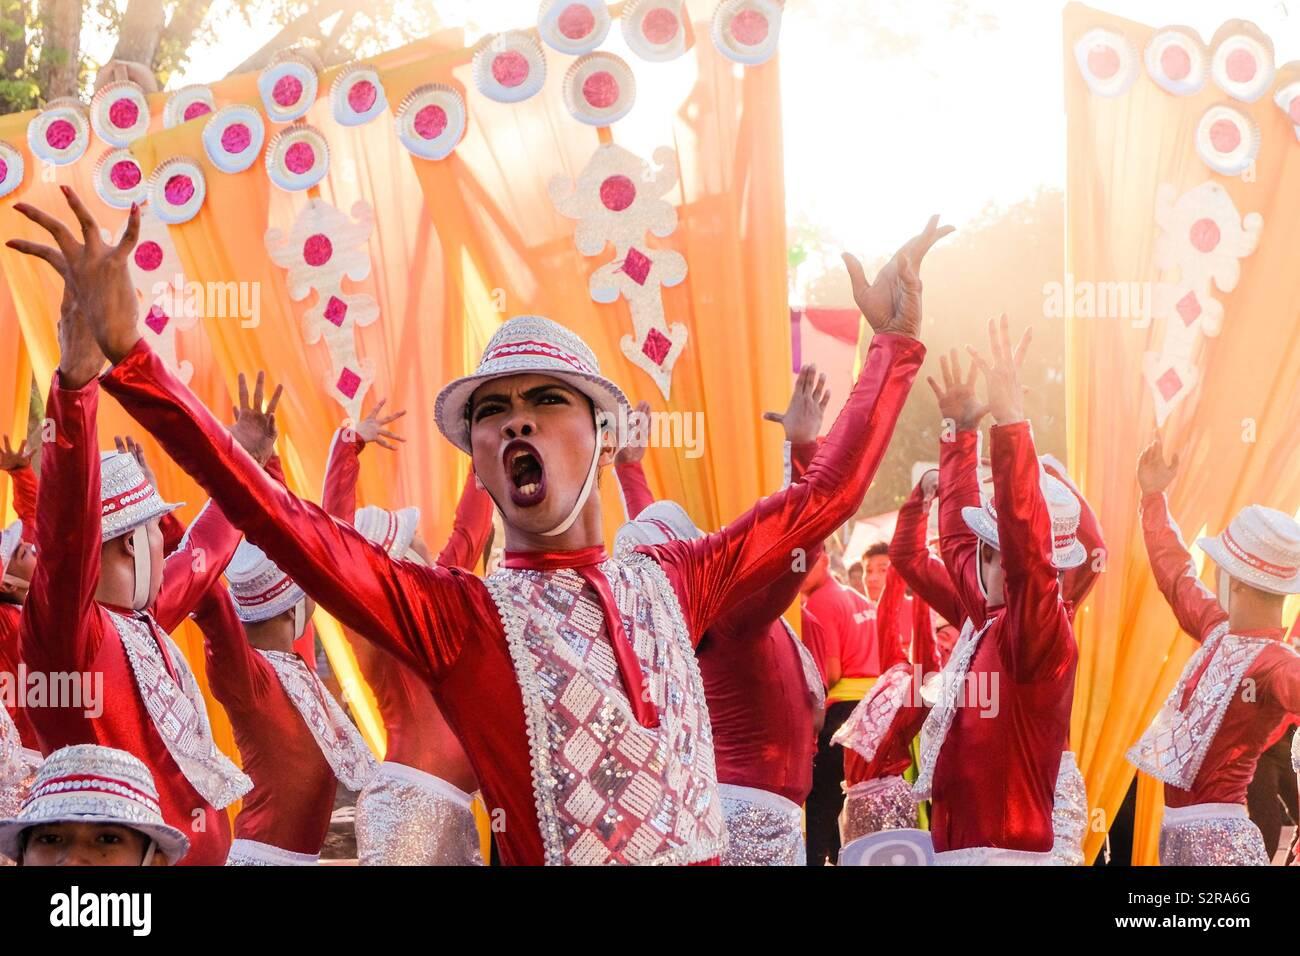 Festival 2018 Anilag Banque D'Images